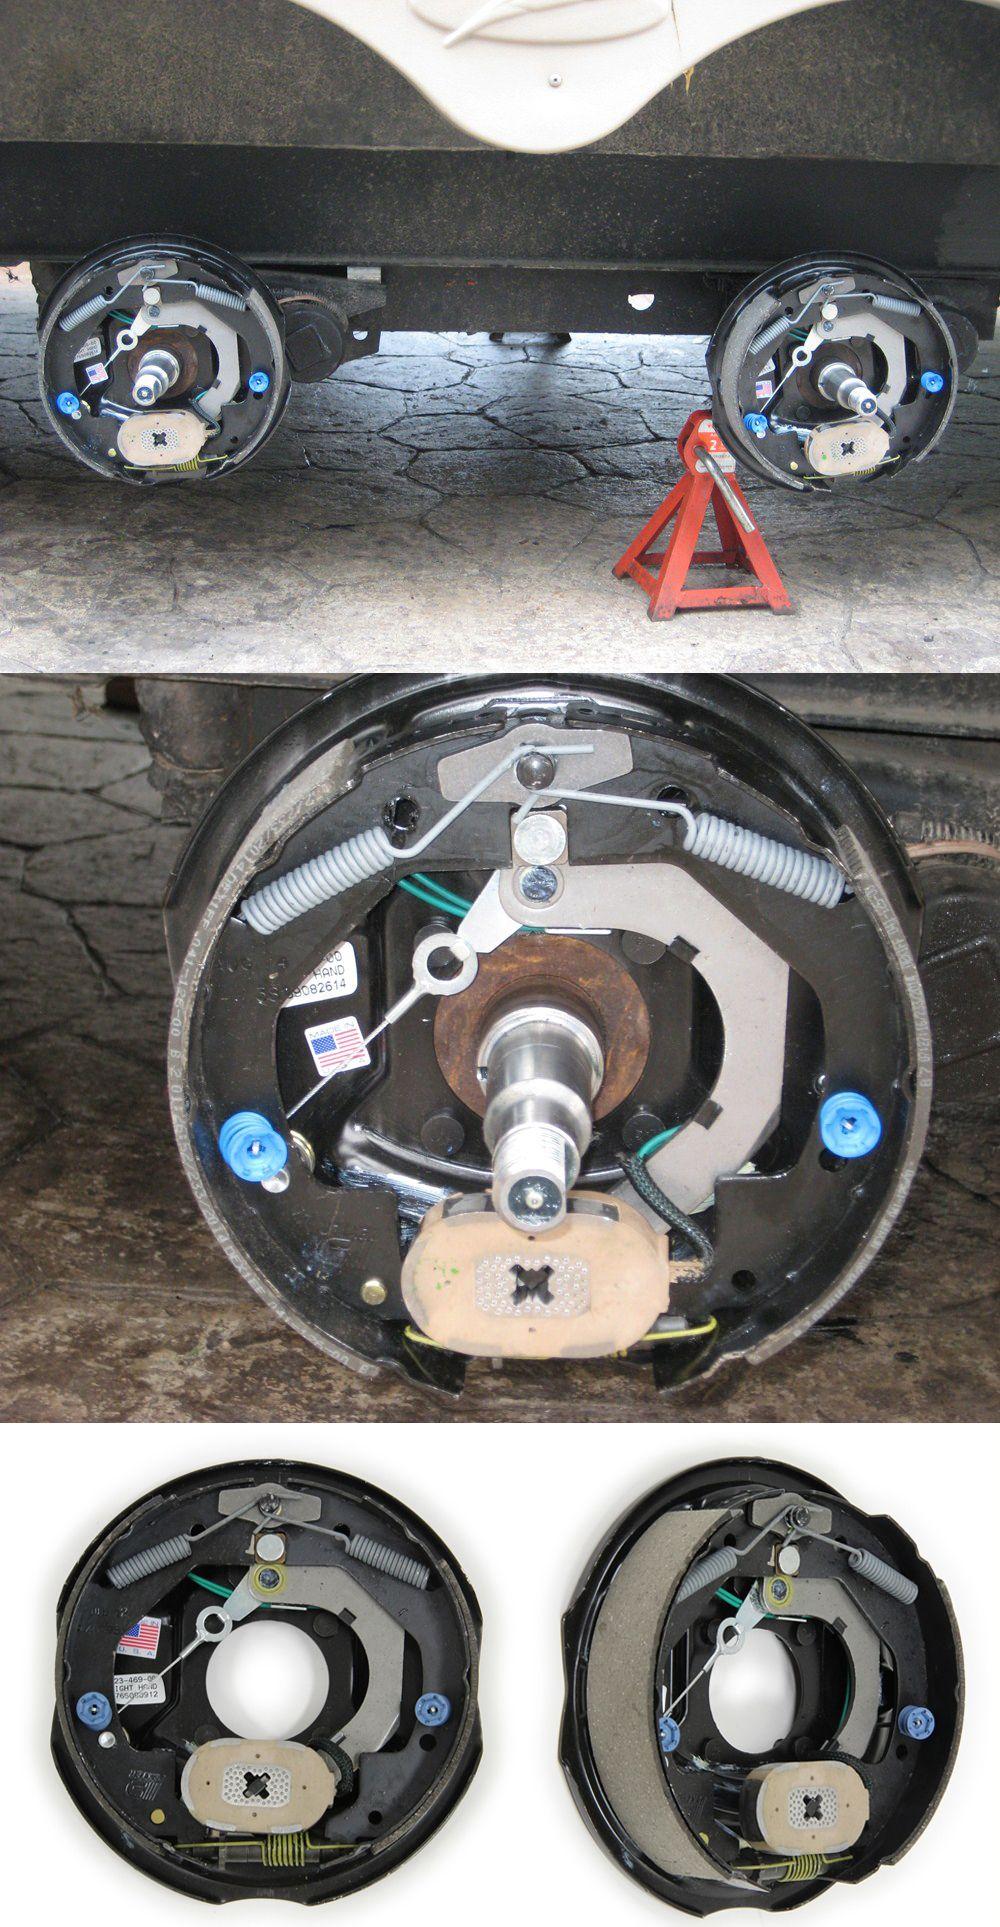 Dexter Trailer Brakes Wiring Diagram Nev R Adjust Electric Brake Assembly